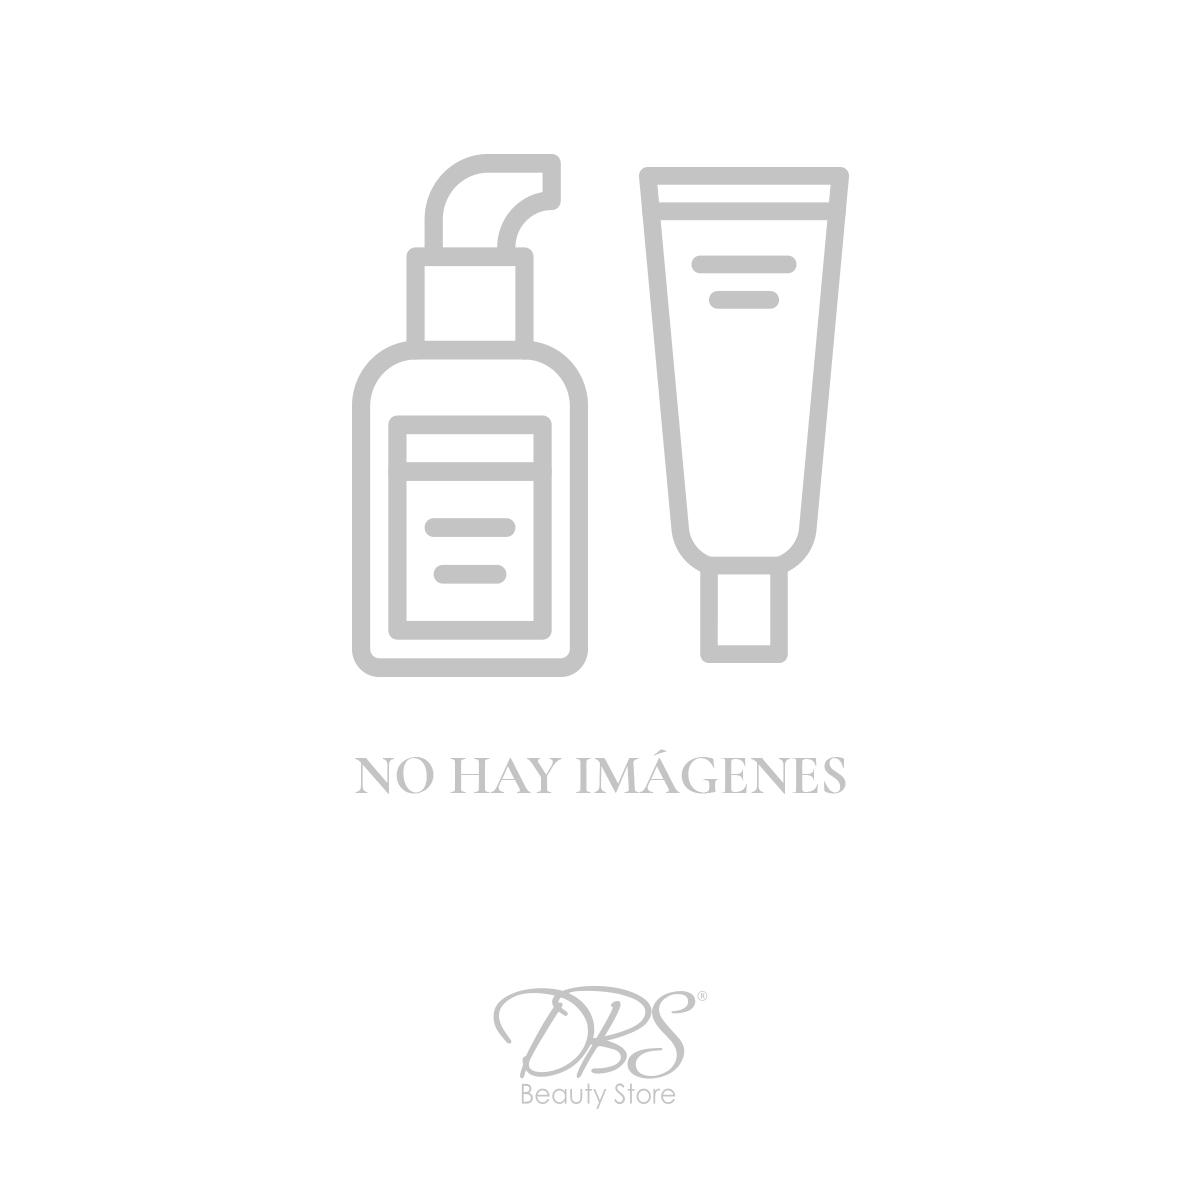 Beauty Box + Class Treat Your Nails